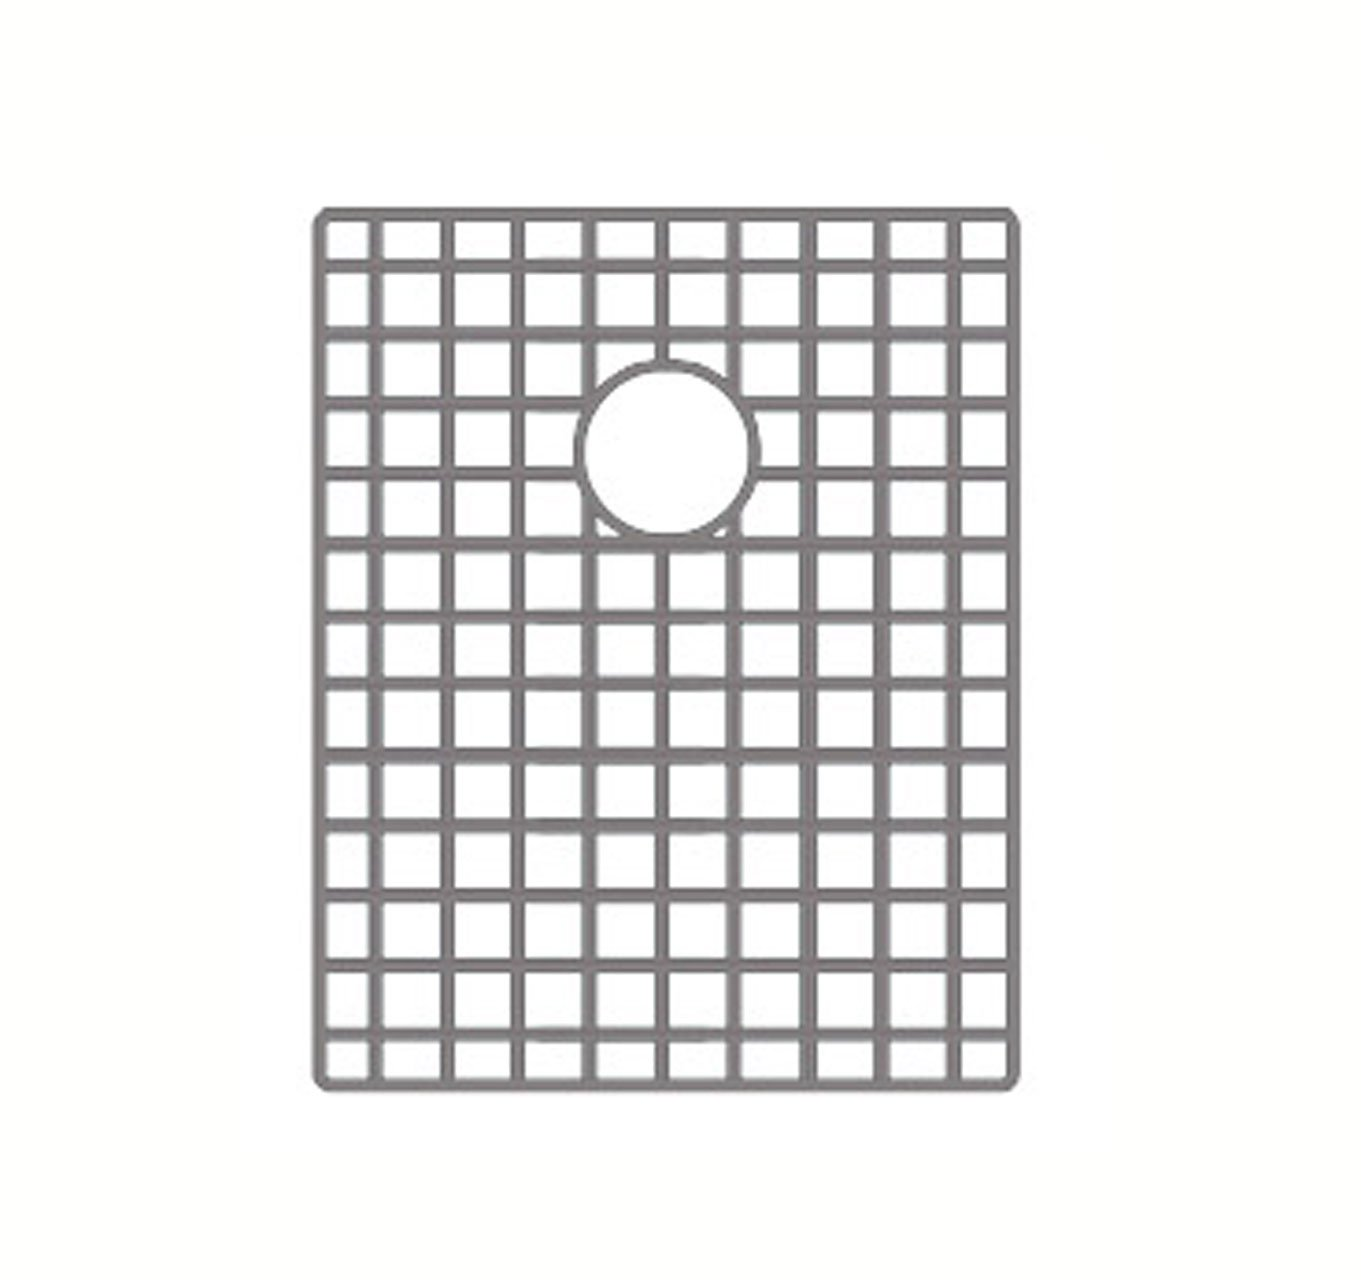 Alfi commercio whncmd3320sg lavandino in acciaio inox grid- in acciaio inox